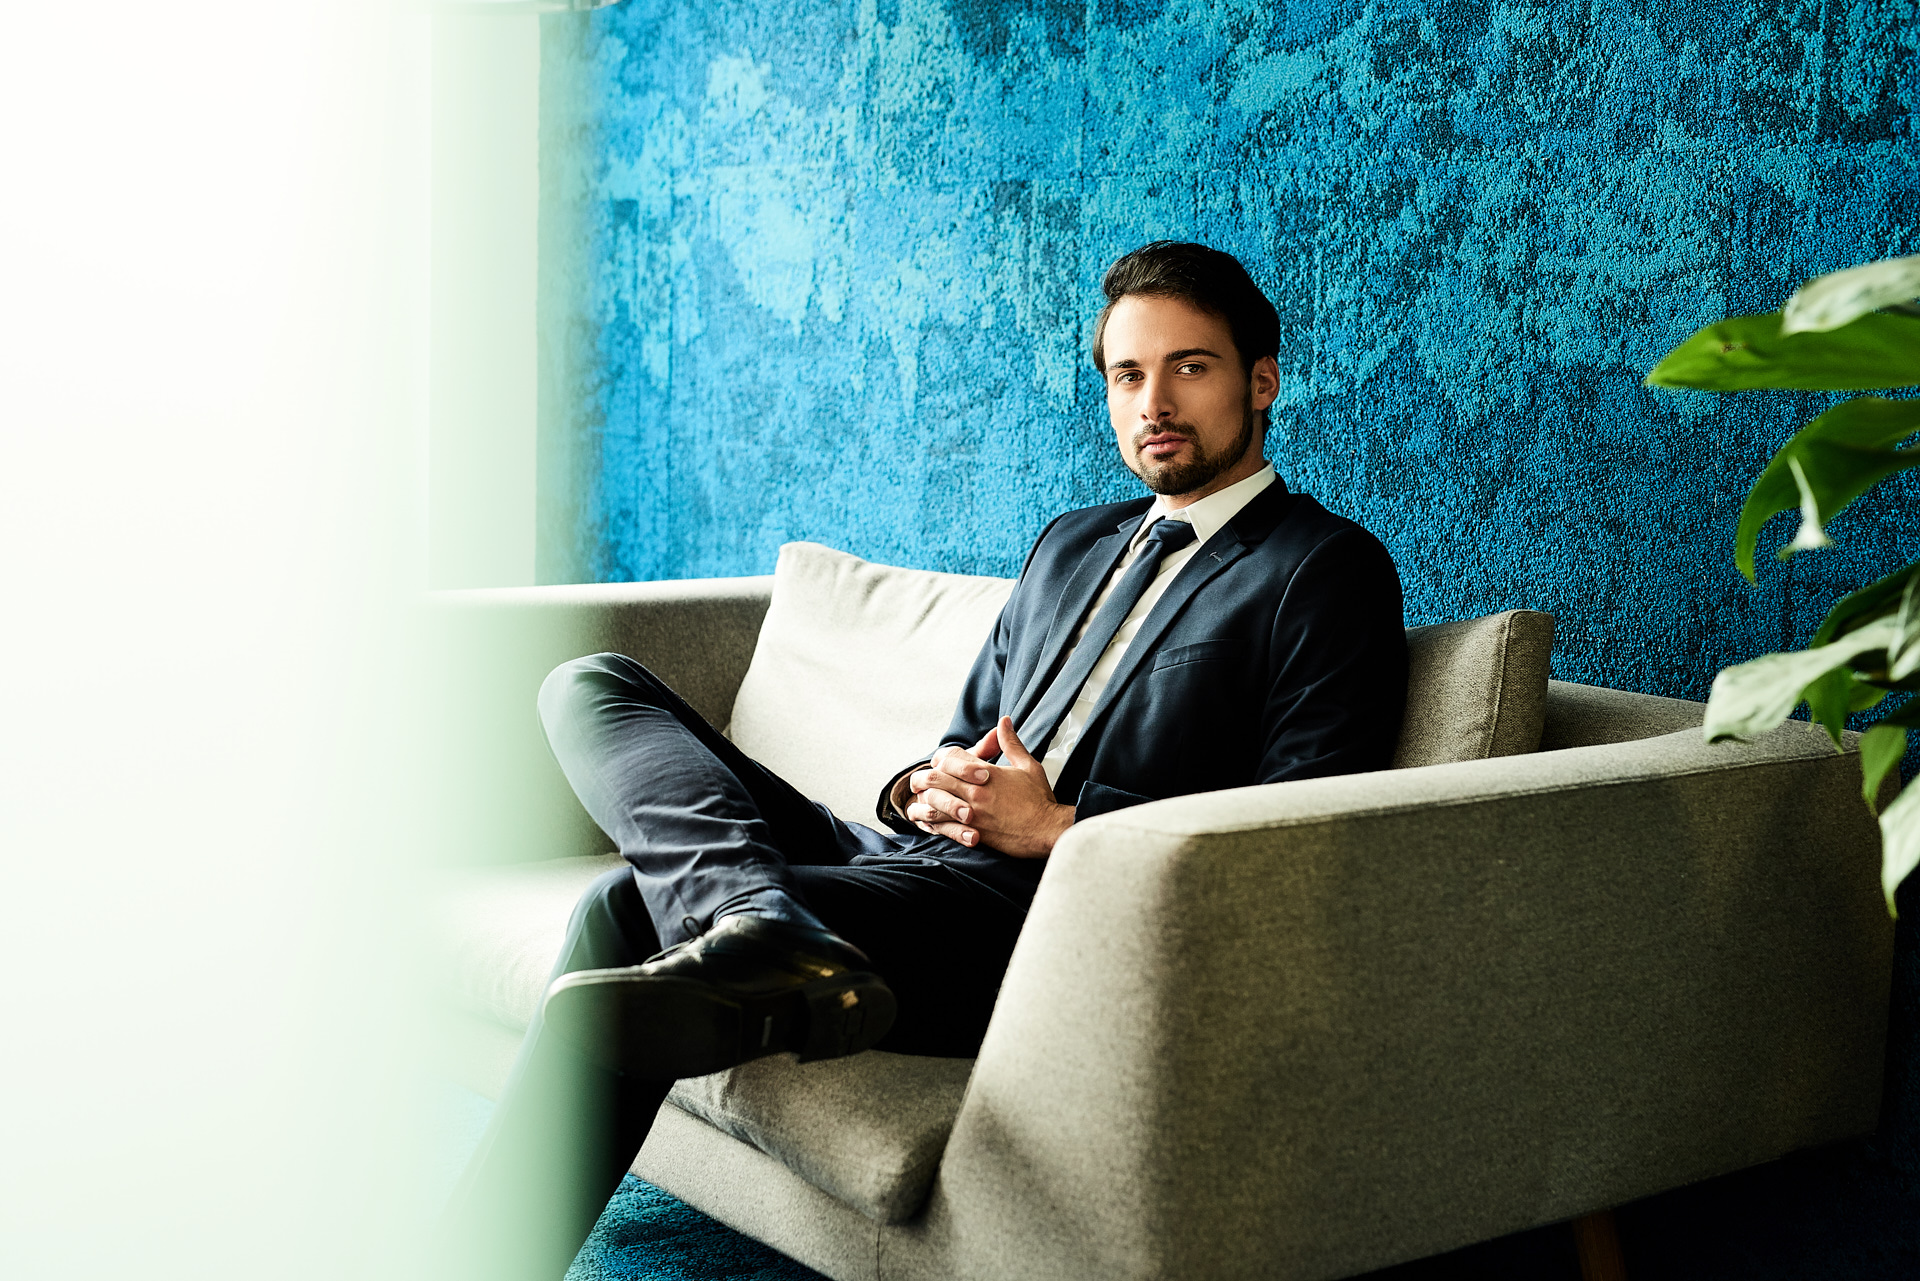 Business Portrait Markus02 by JHofer-Foto Juergen Hofer